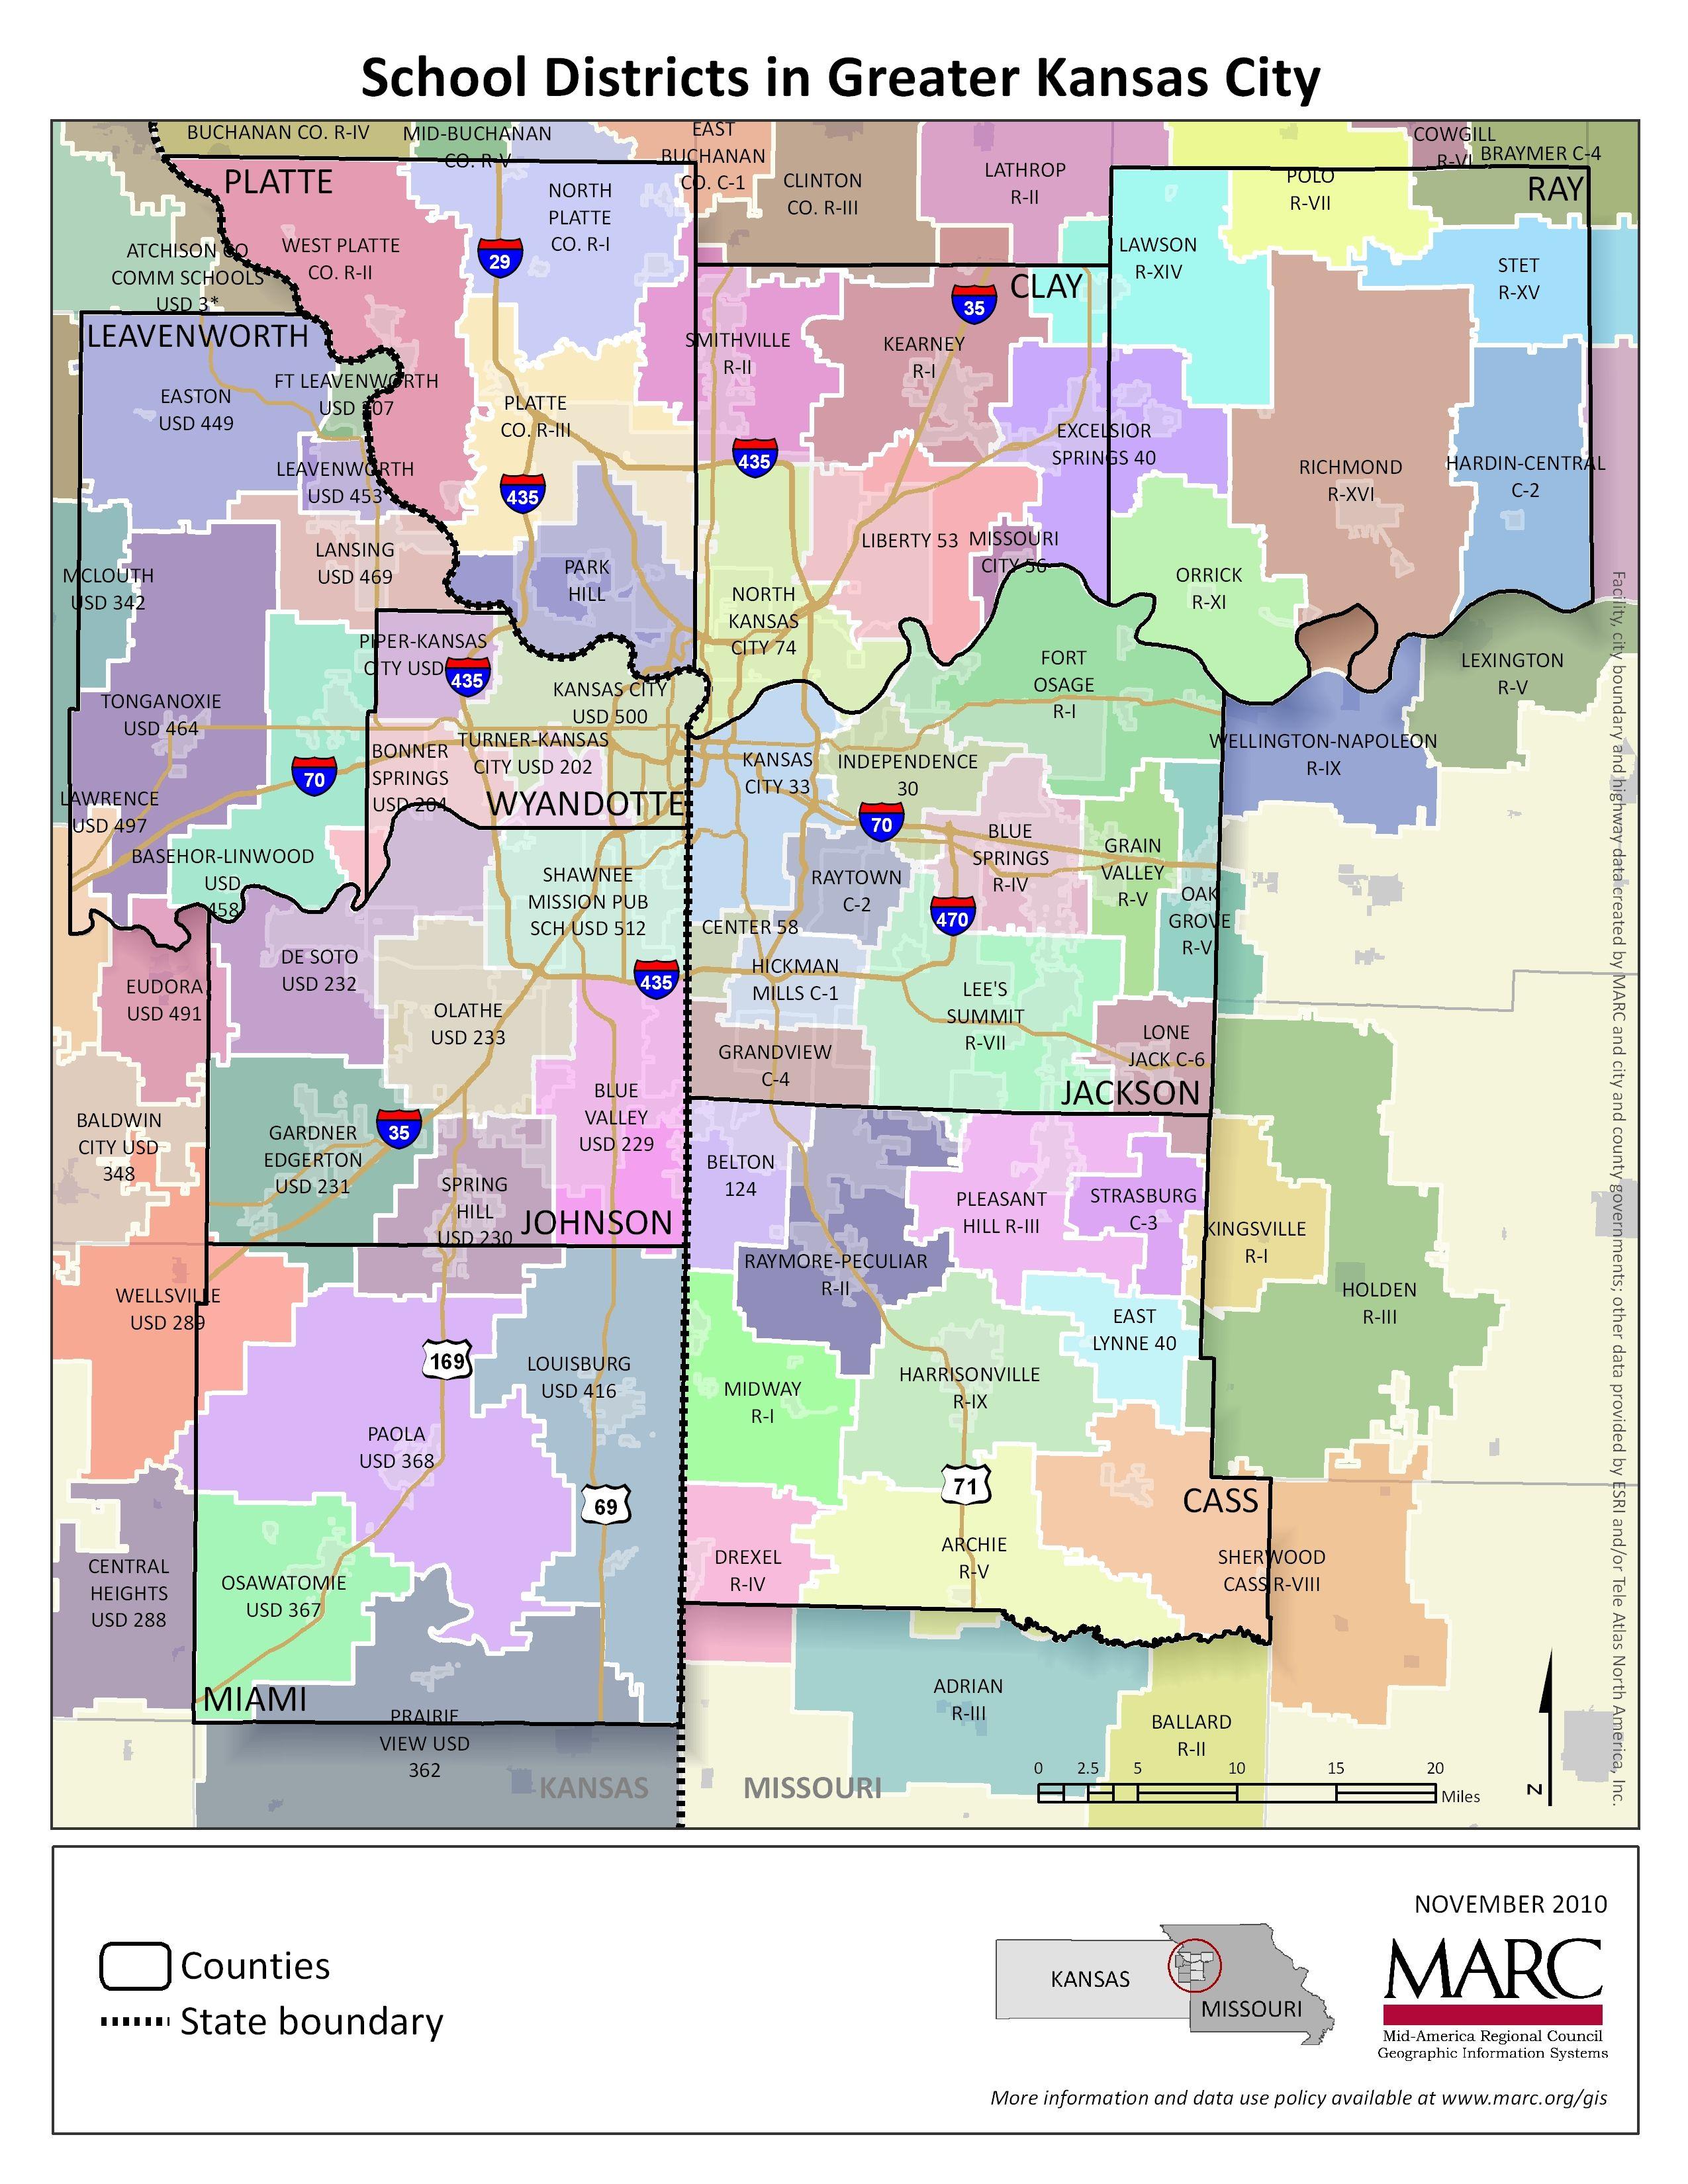 Pin by Michael Kruse on Kansas City History - Maps | Kansas map ...